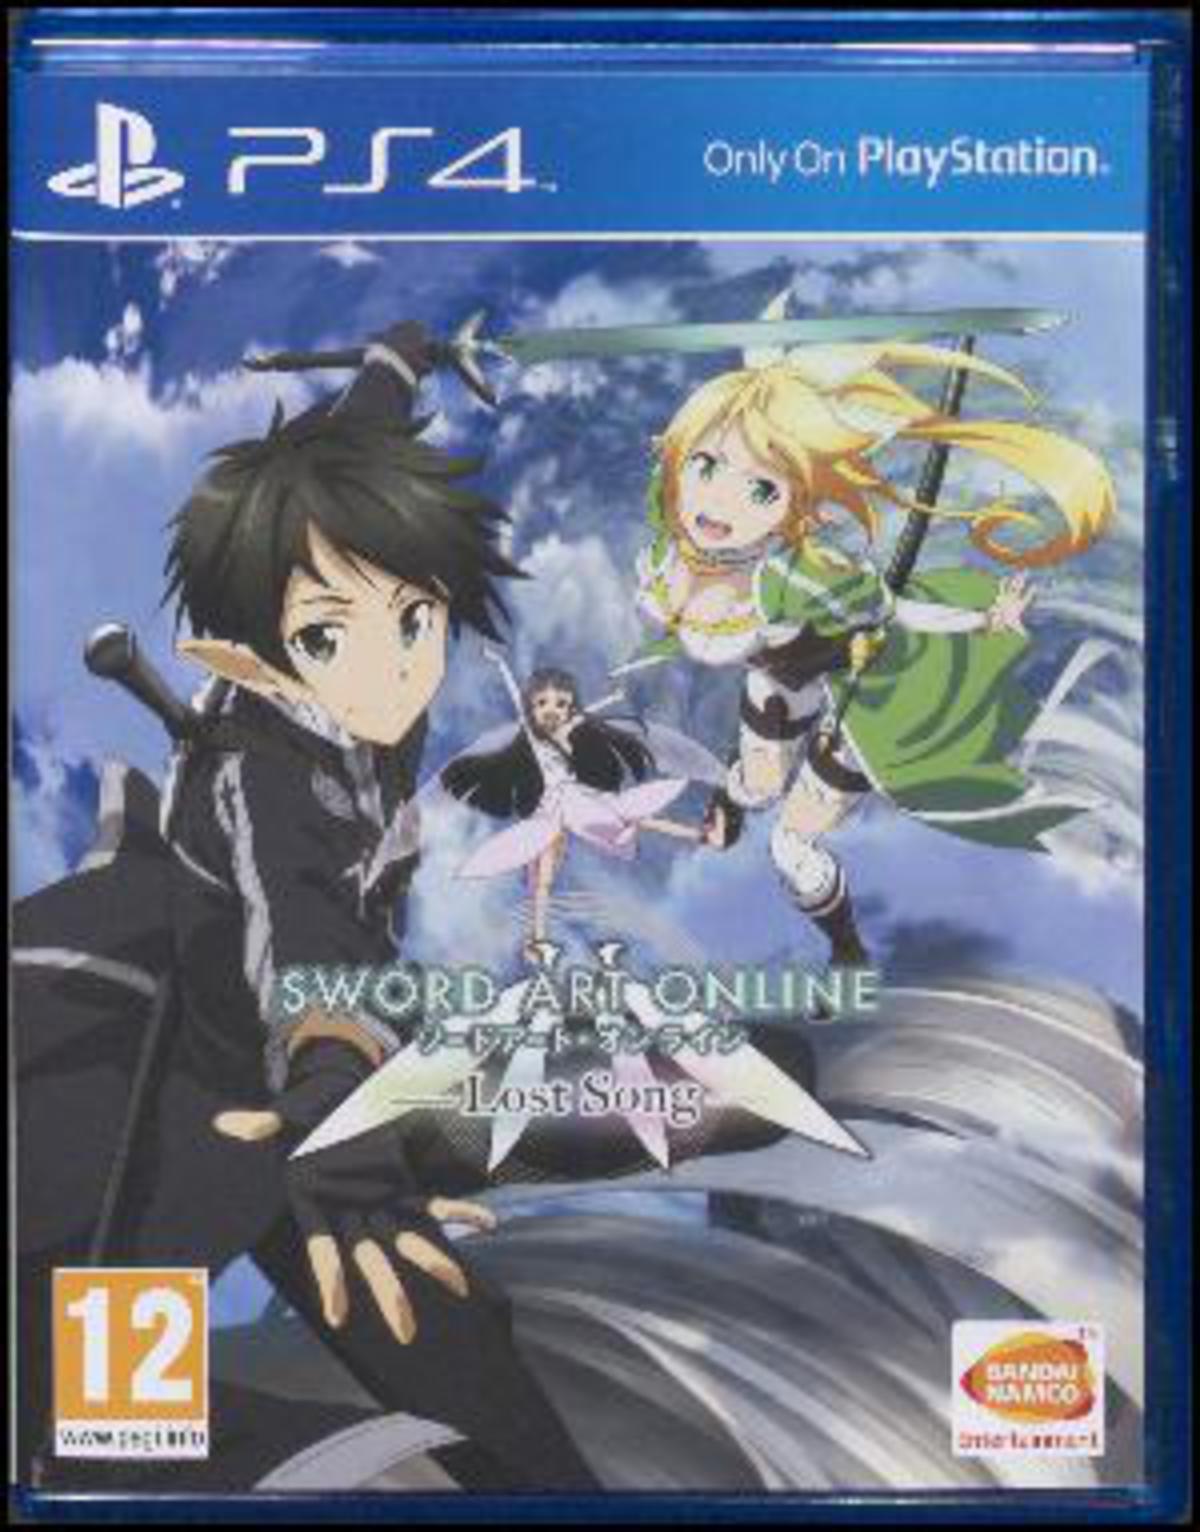 Sword Art Online - Lost Song - Sword Art Online - Andet - Bandai Namco - 3391891985772 - 13/11-2015